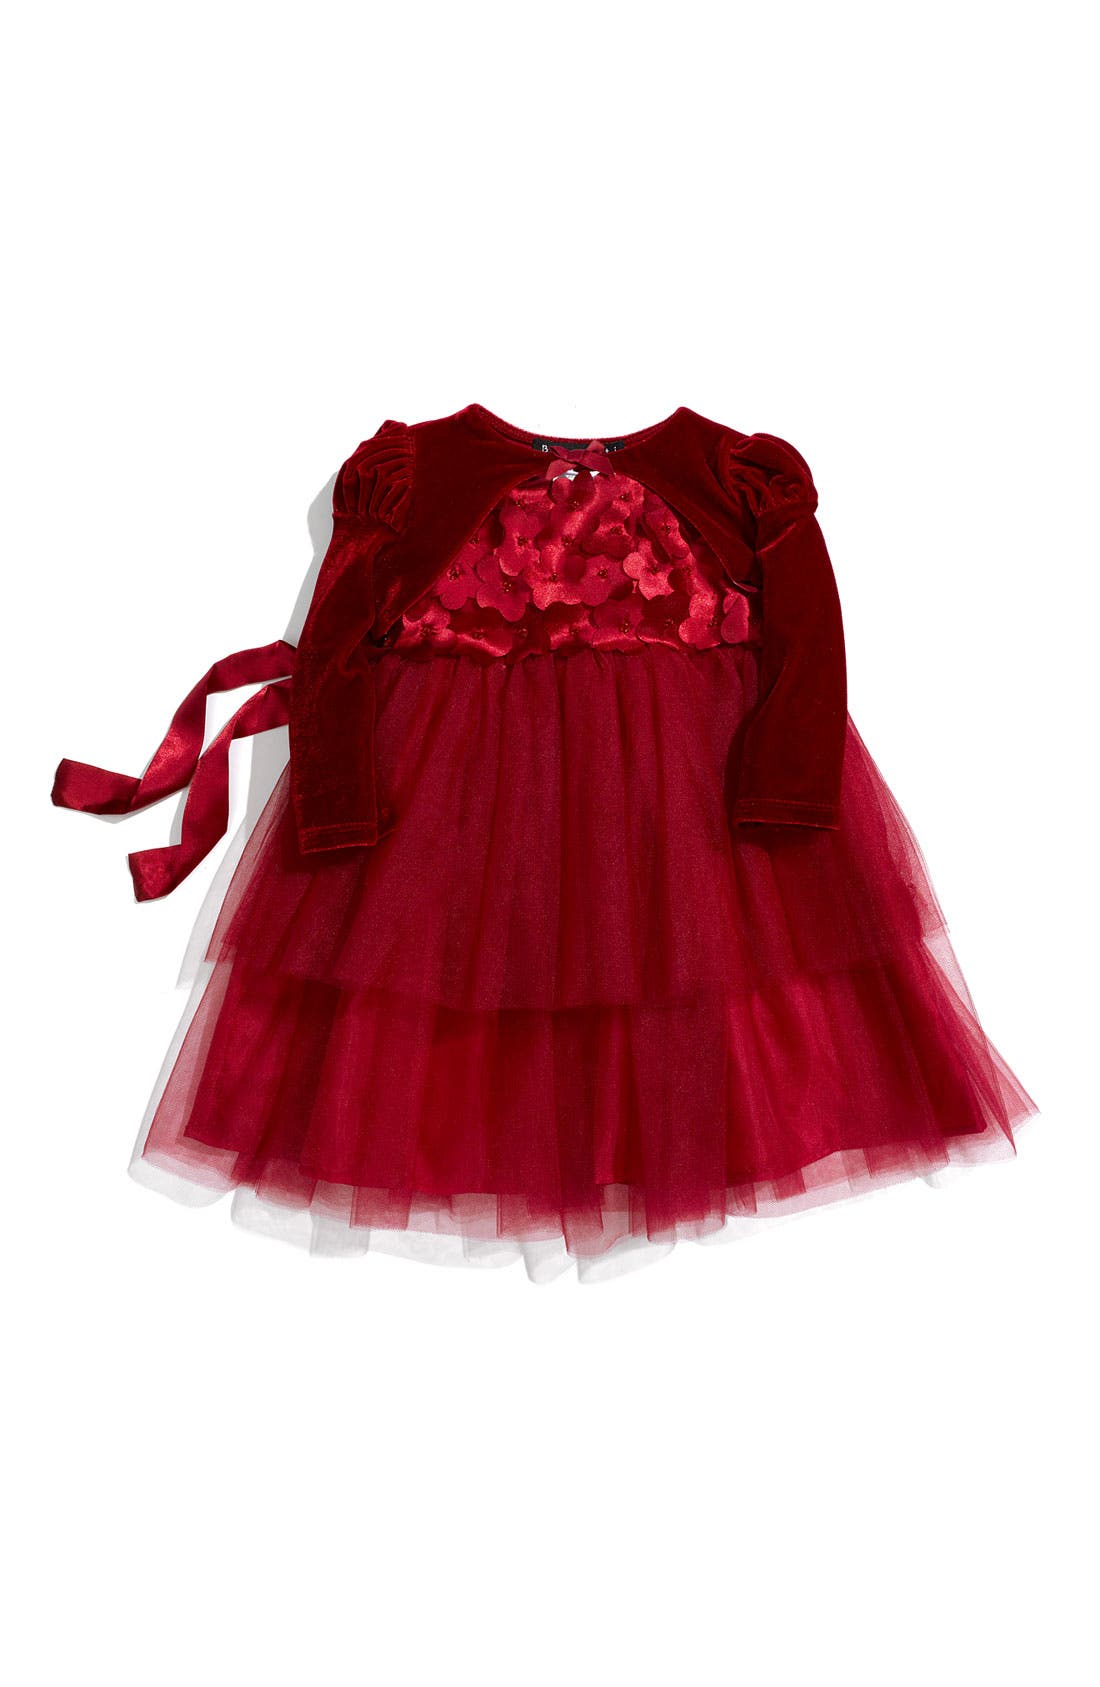 Main Image - Biscotti Dress & Shrug (Infant)